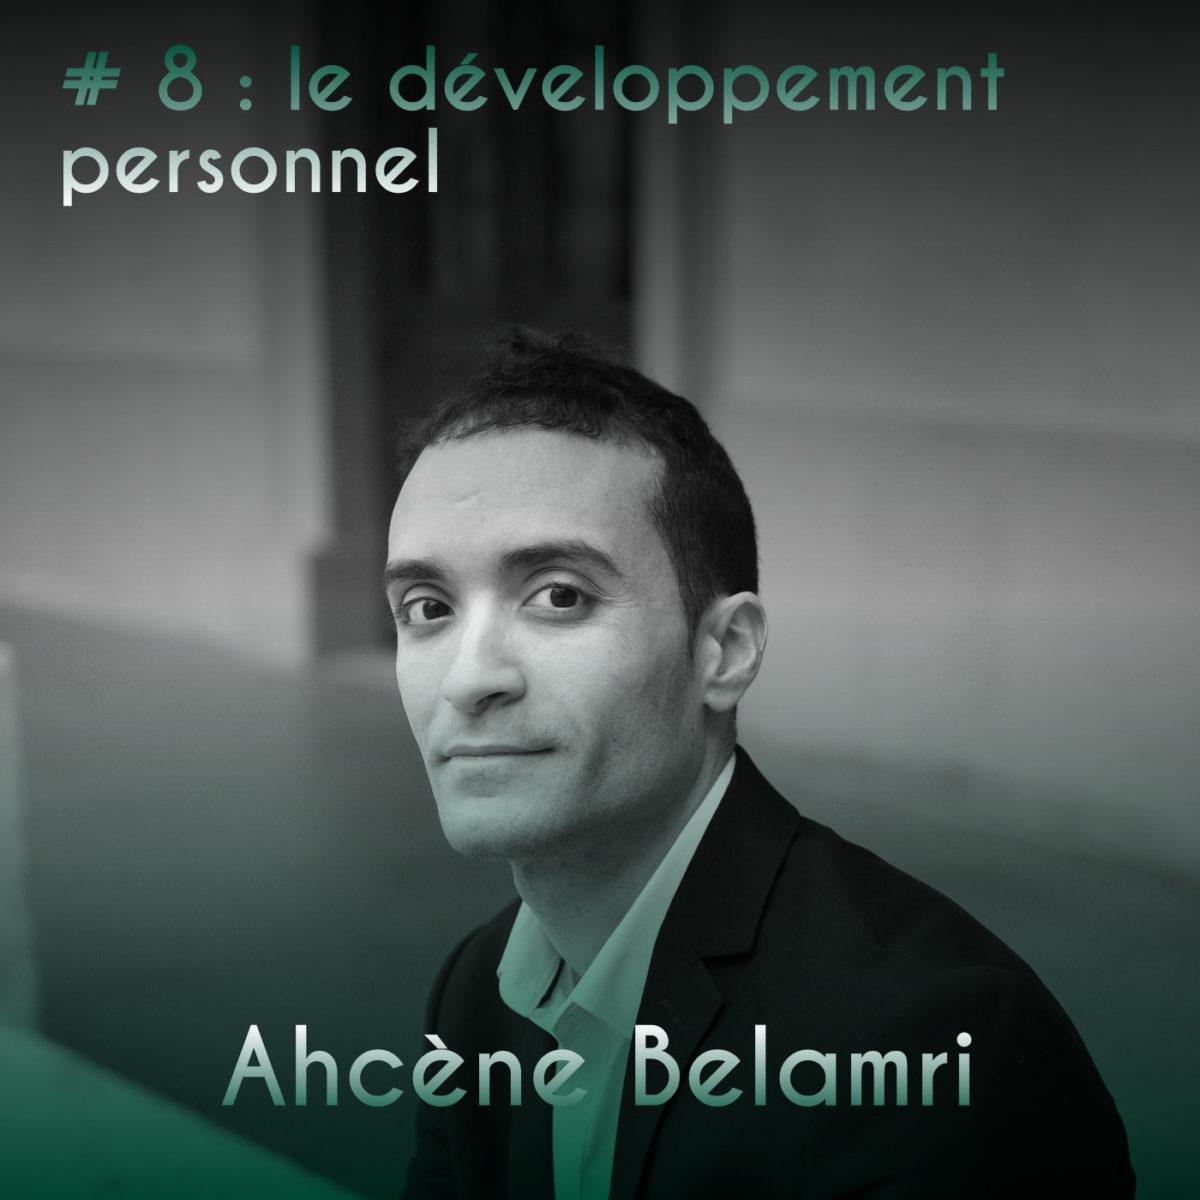 Couverture Podcast #8 Ahcène Belamri